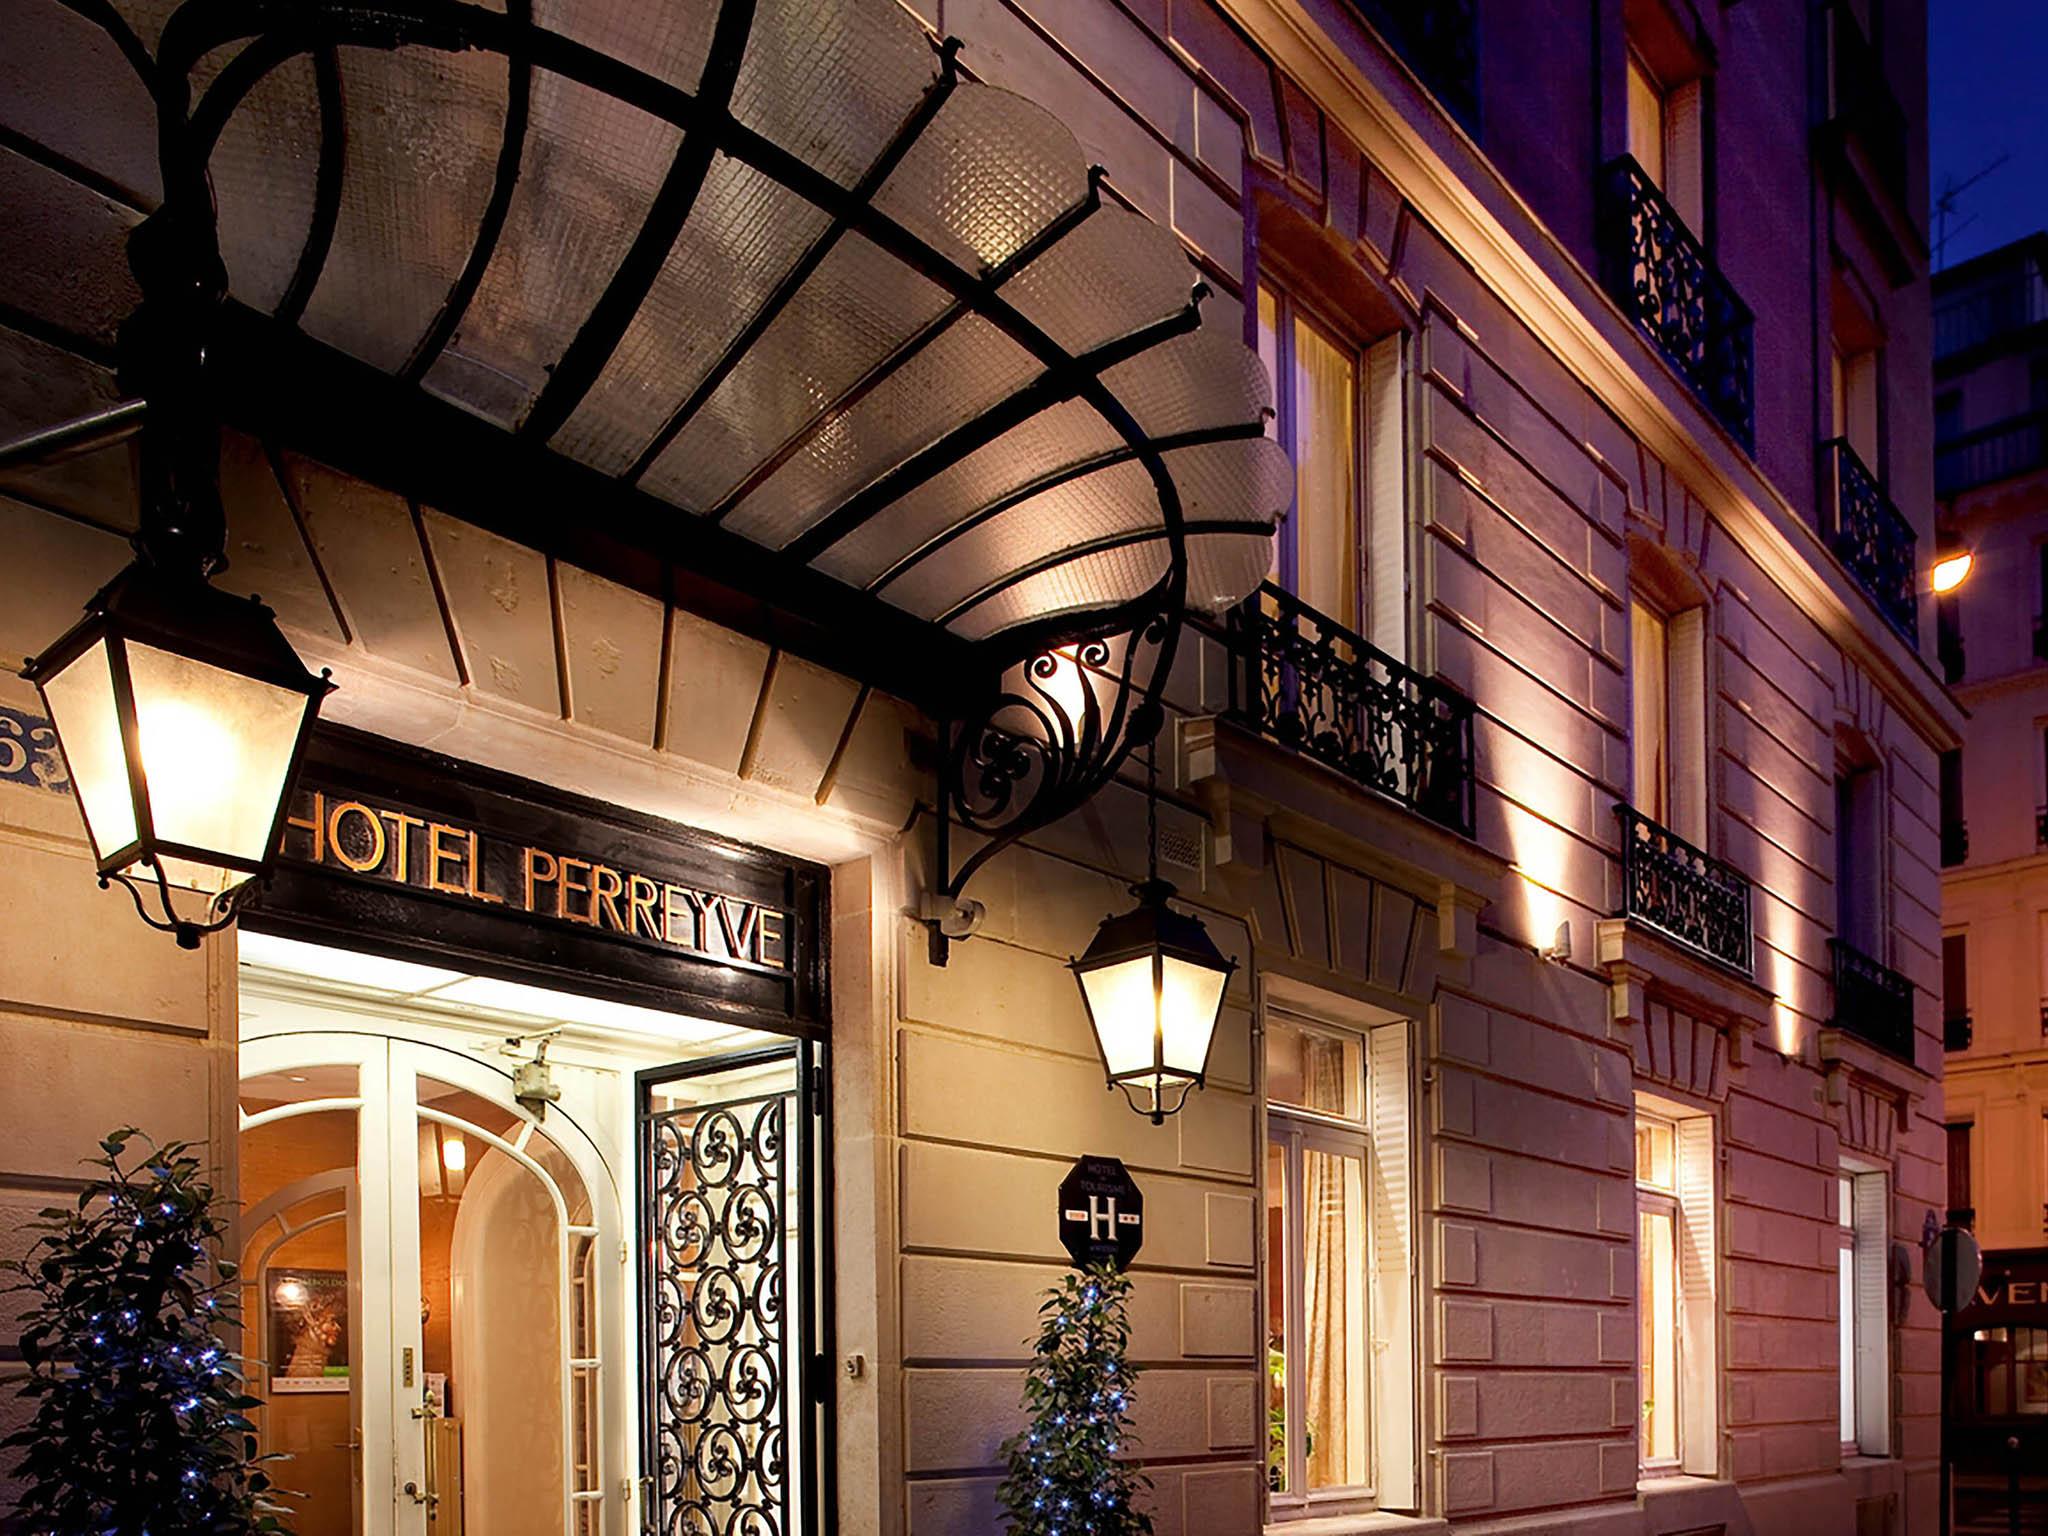 hotel in paris hotel perreyve. Black Bedroom Furniture Sets. Home Design Ideas